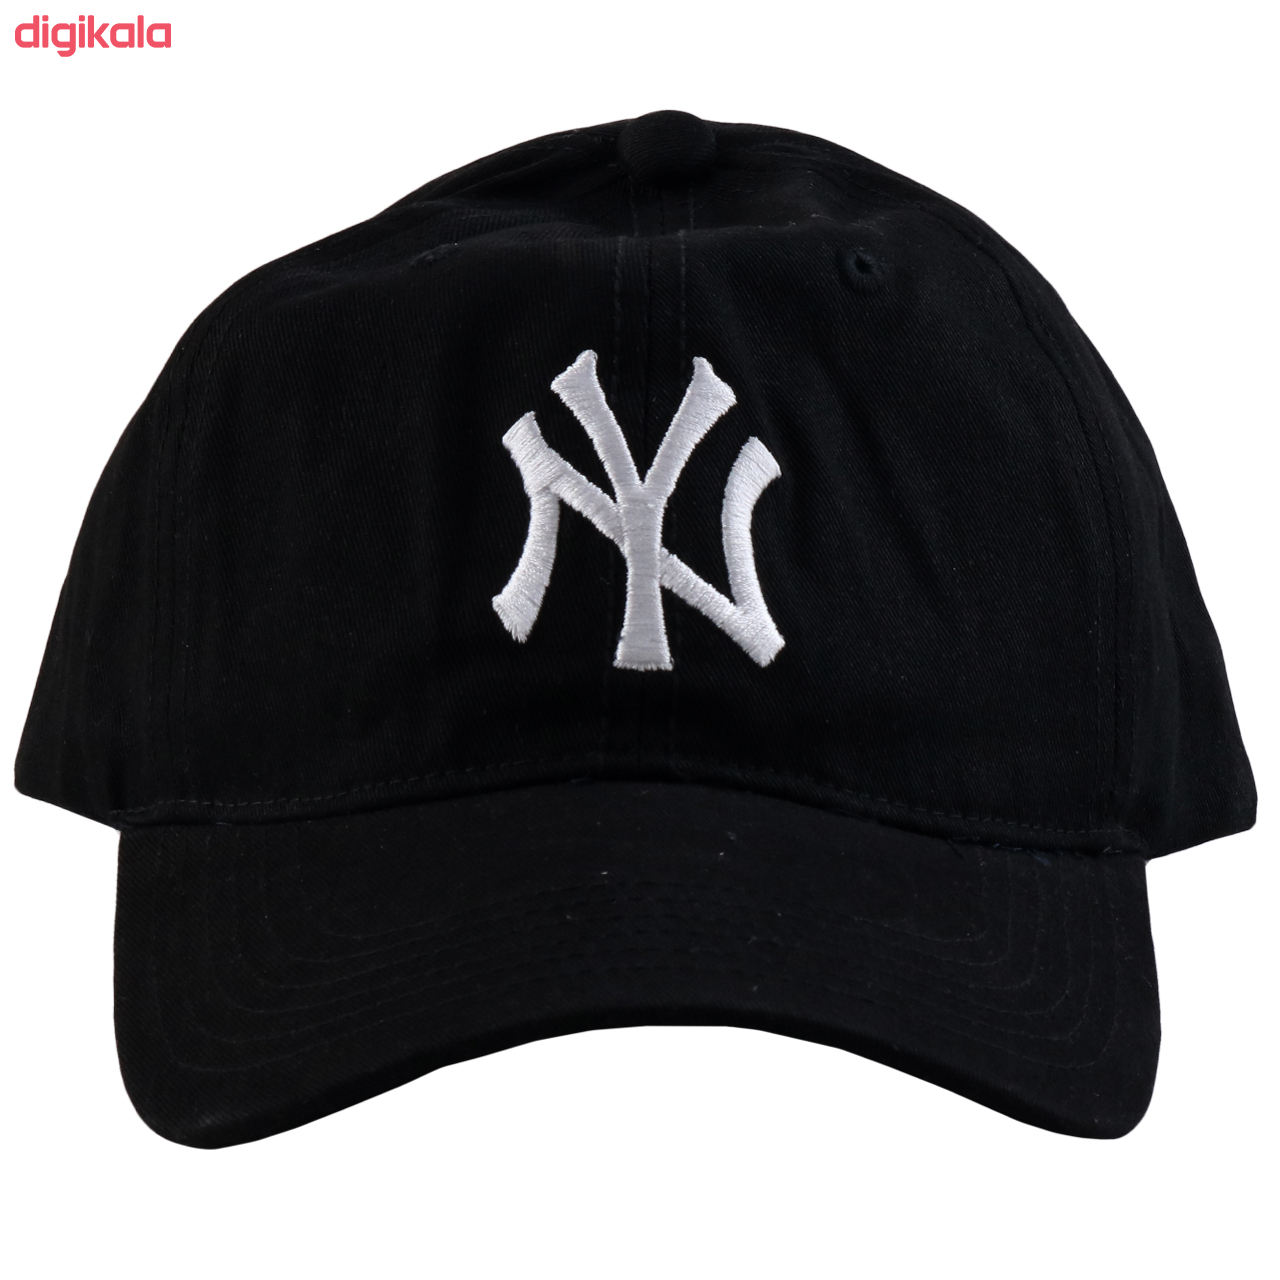 کلاه کپ طرح NY کد 4832 main 1 2